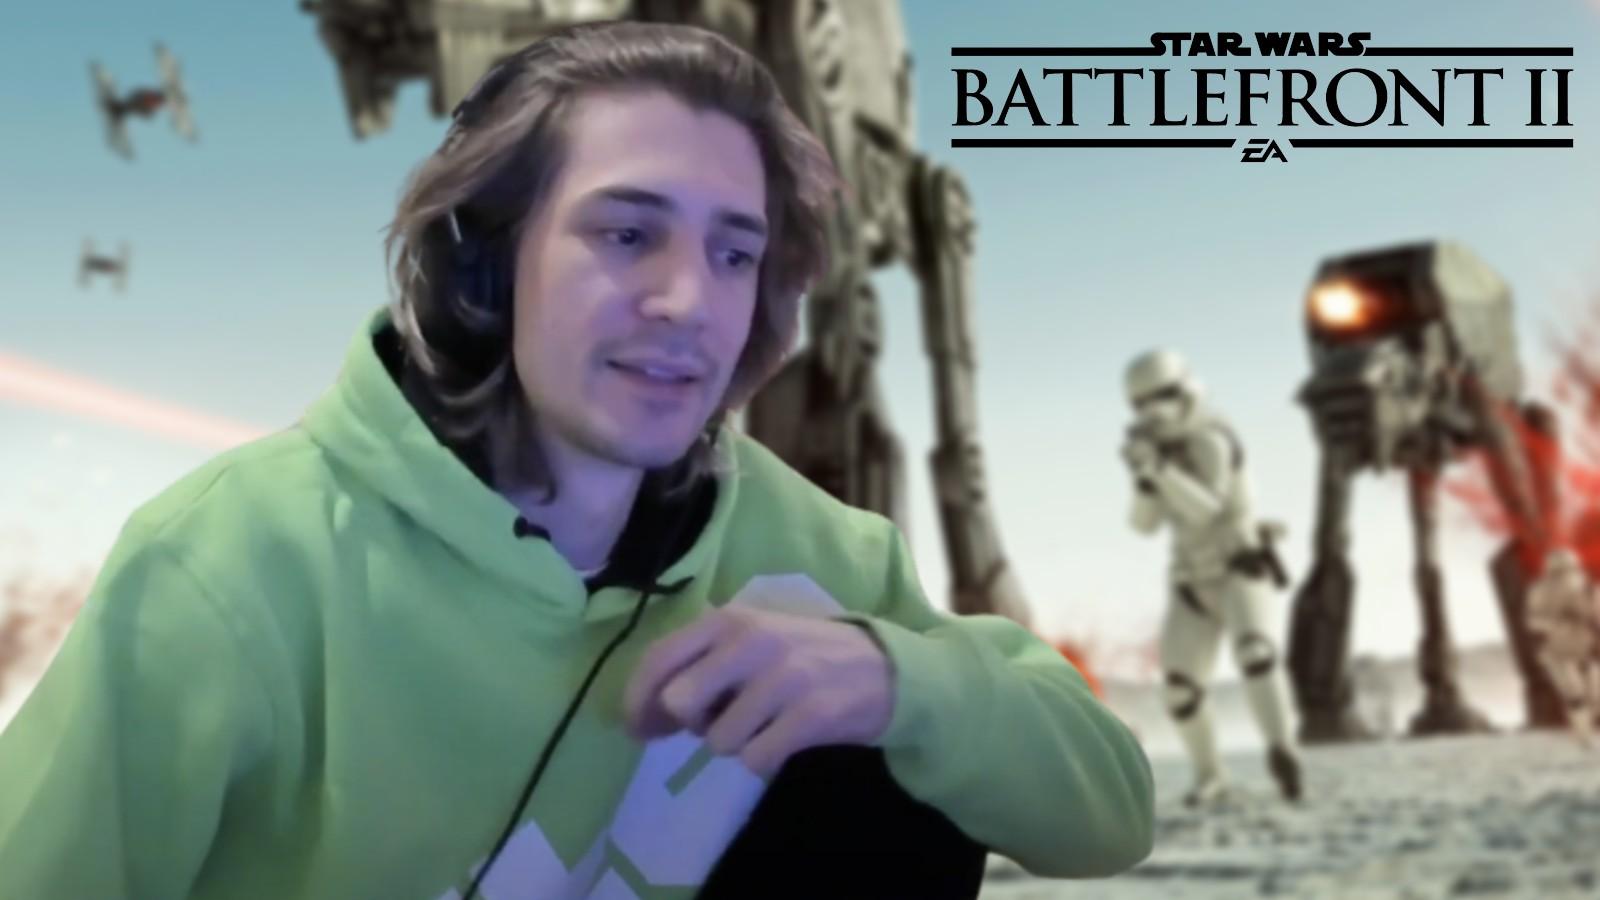 xQc on Star Wars Battlefront II